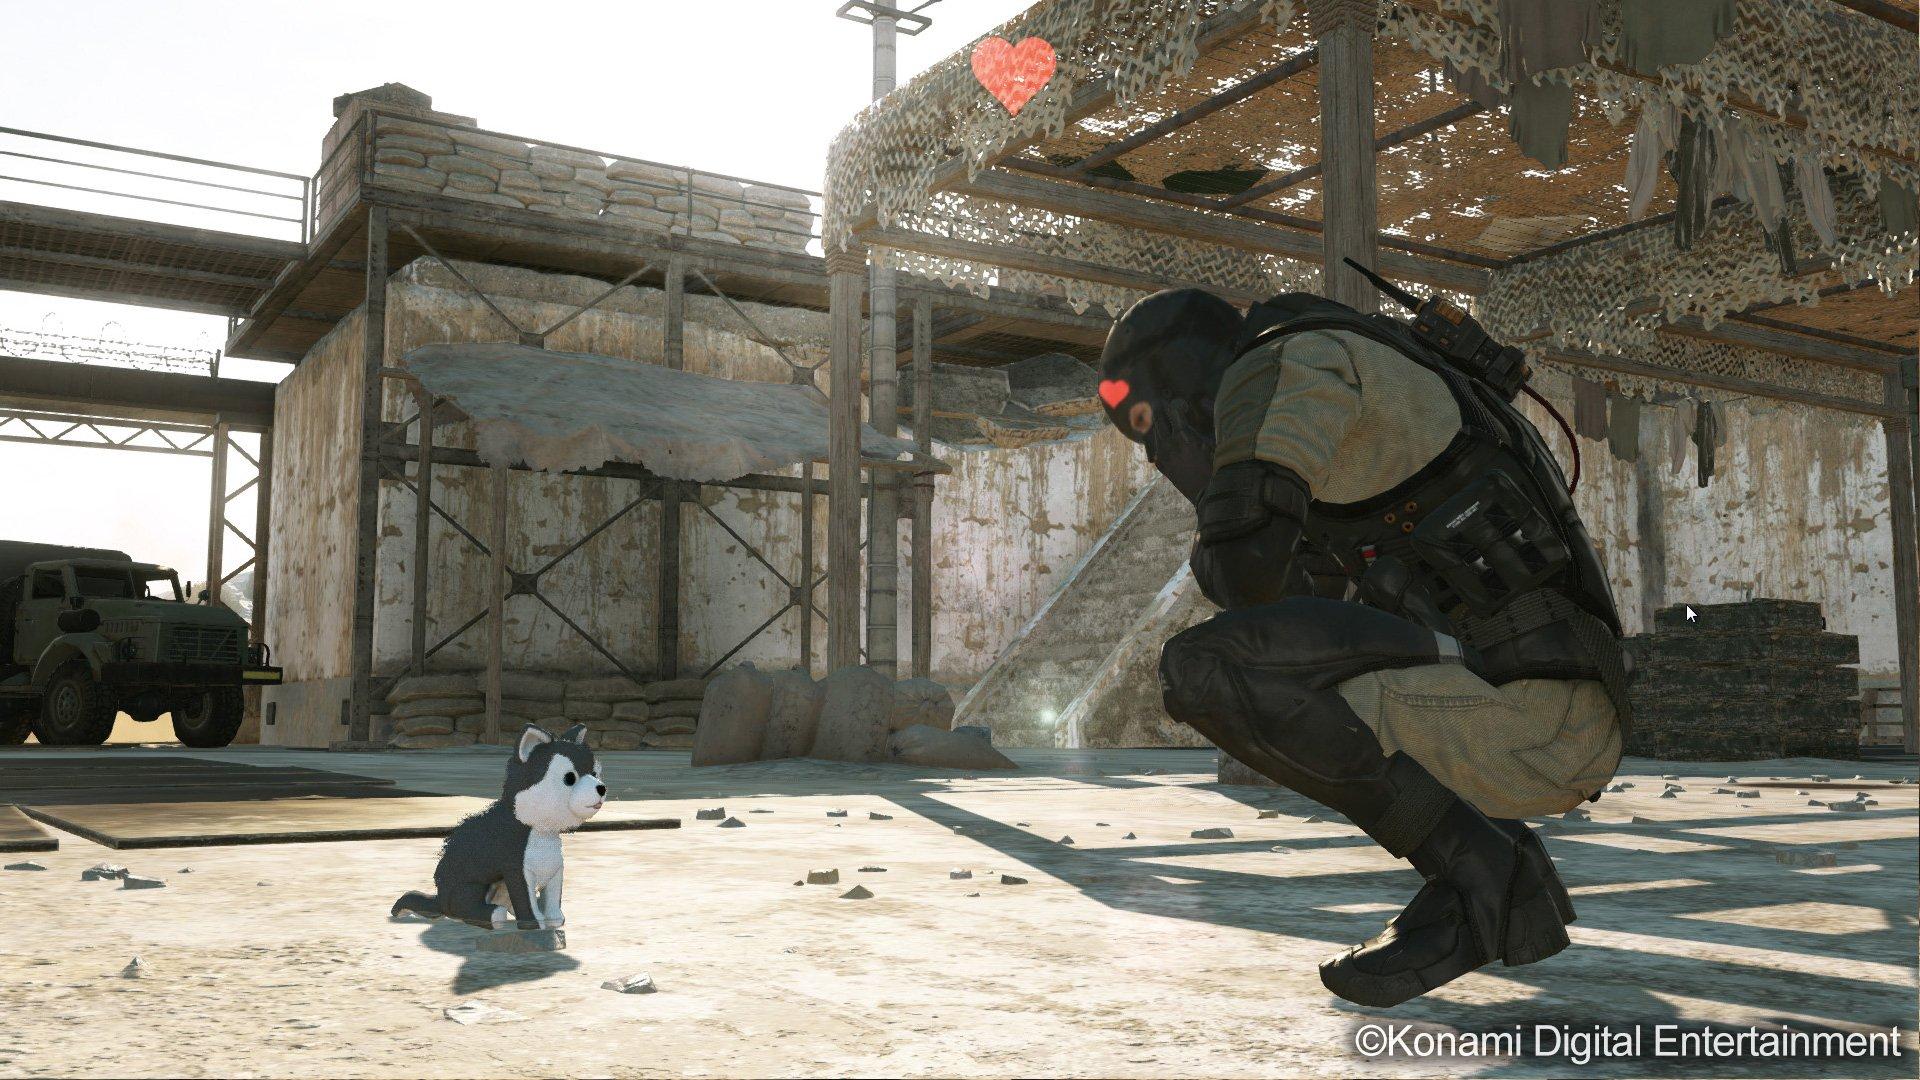 Metal Gear Solid V The Phantom Pain Fondo De Pantalla Hd